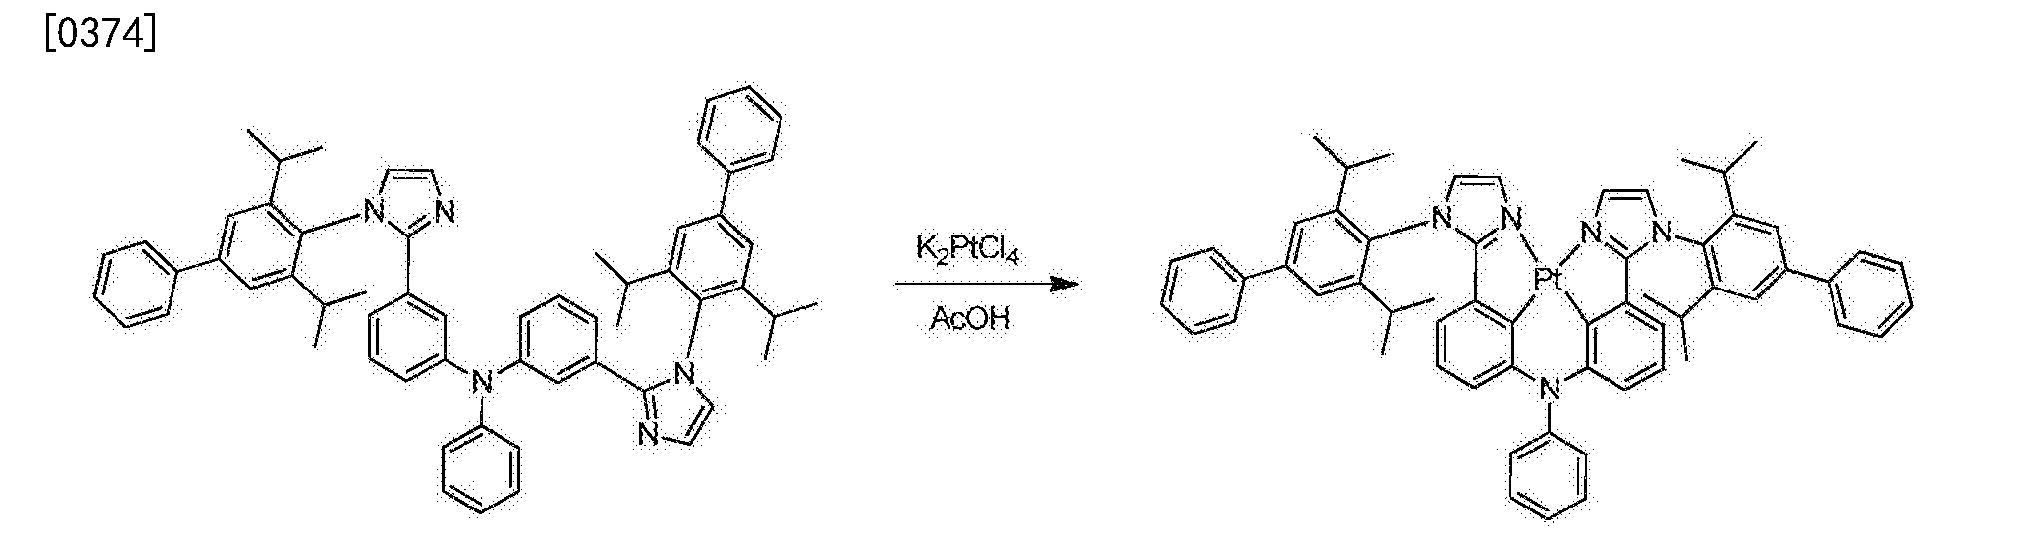 Figure CN106749425AD01322